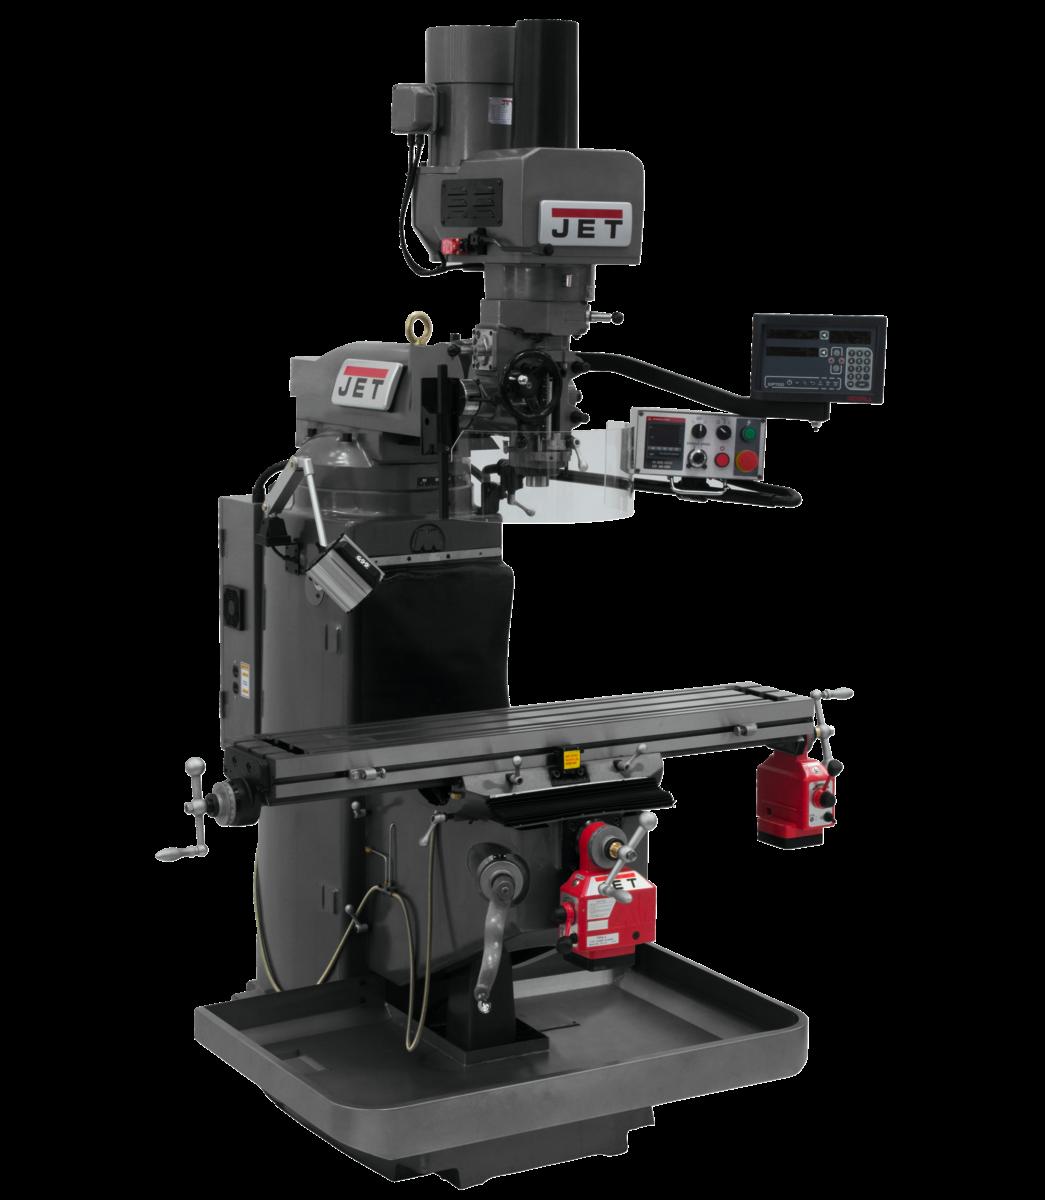 JTM-949EVS with Newall DP700 DRO, X & Y Powerfeeds & Air Power Drawbar